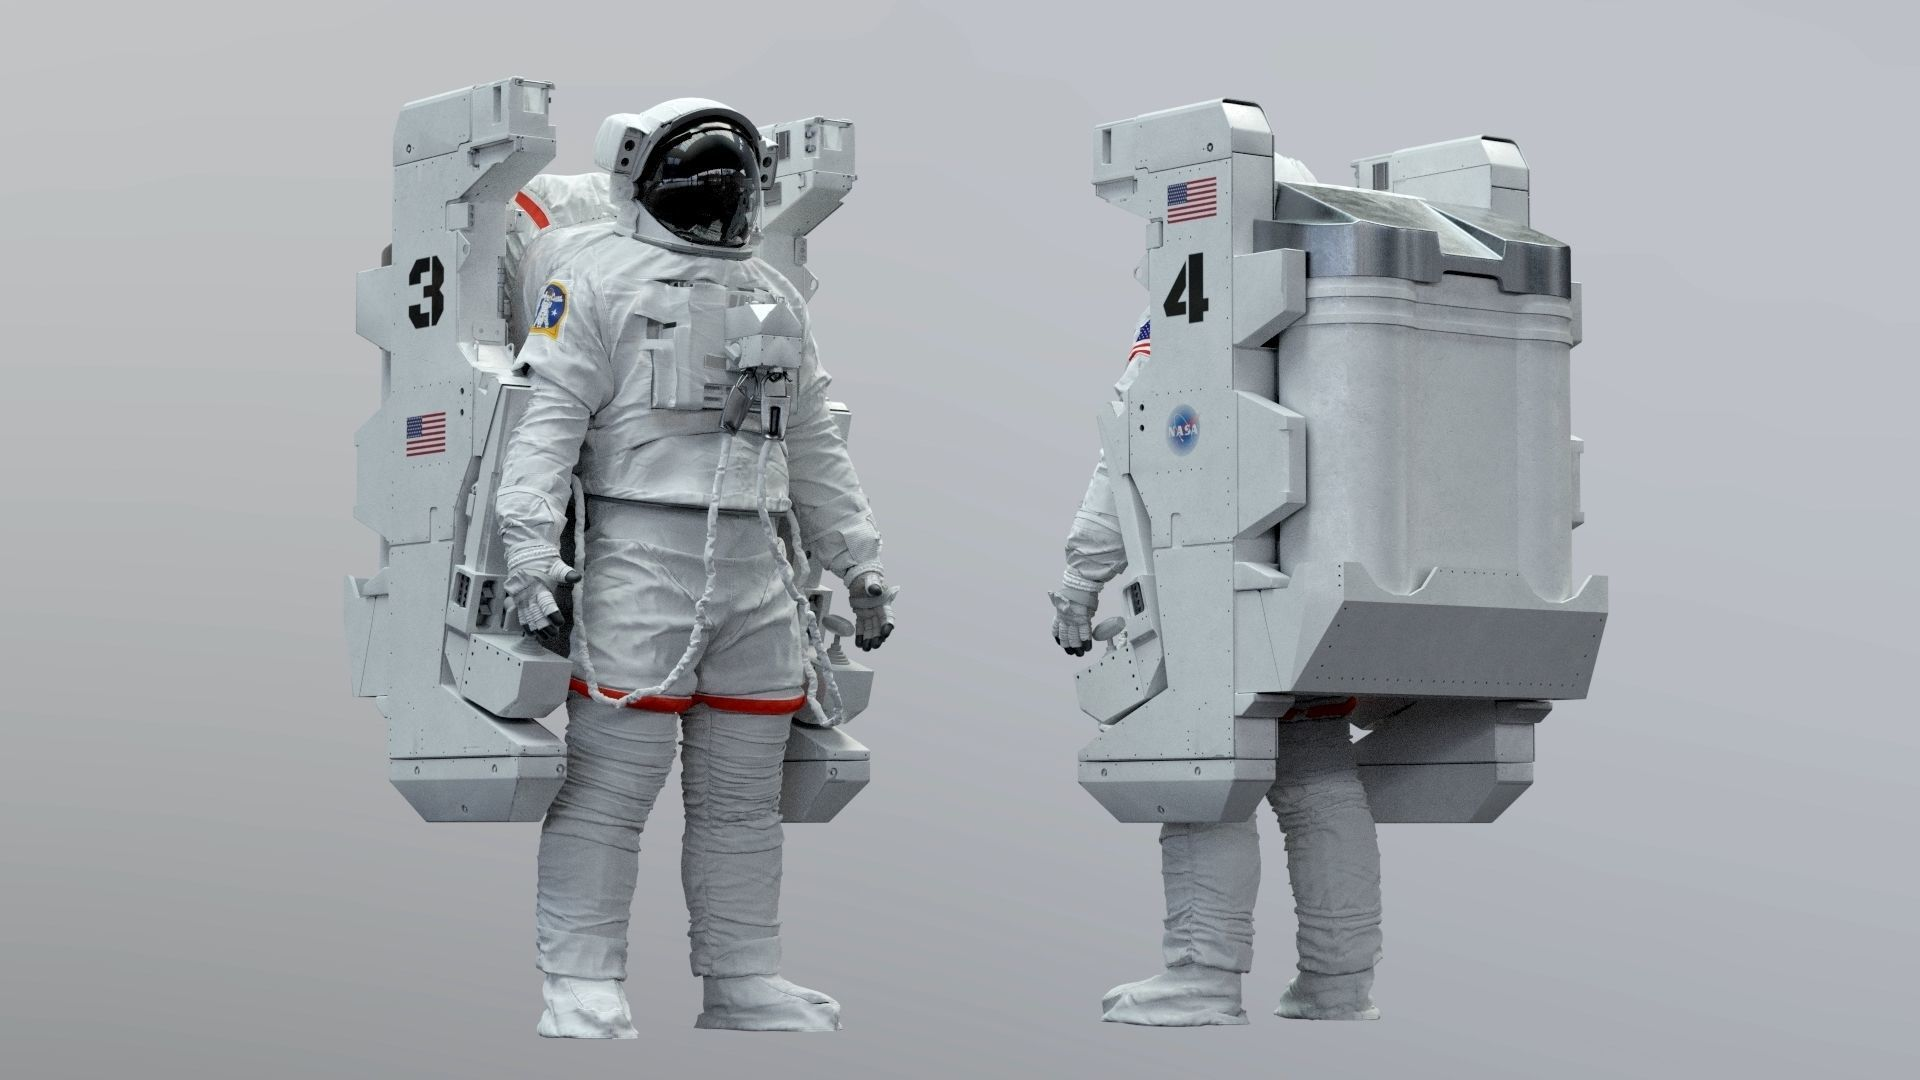 SPACESUIT NASA EMU MMU SAFER